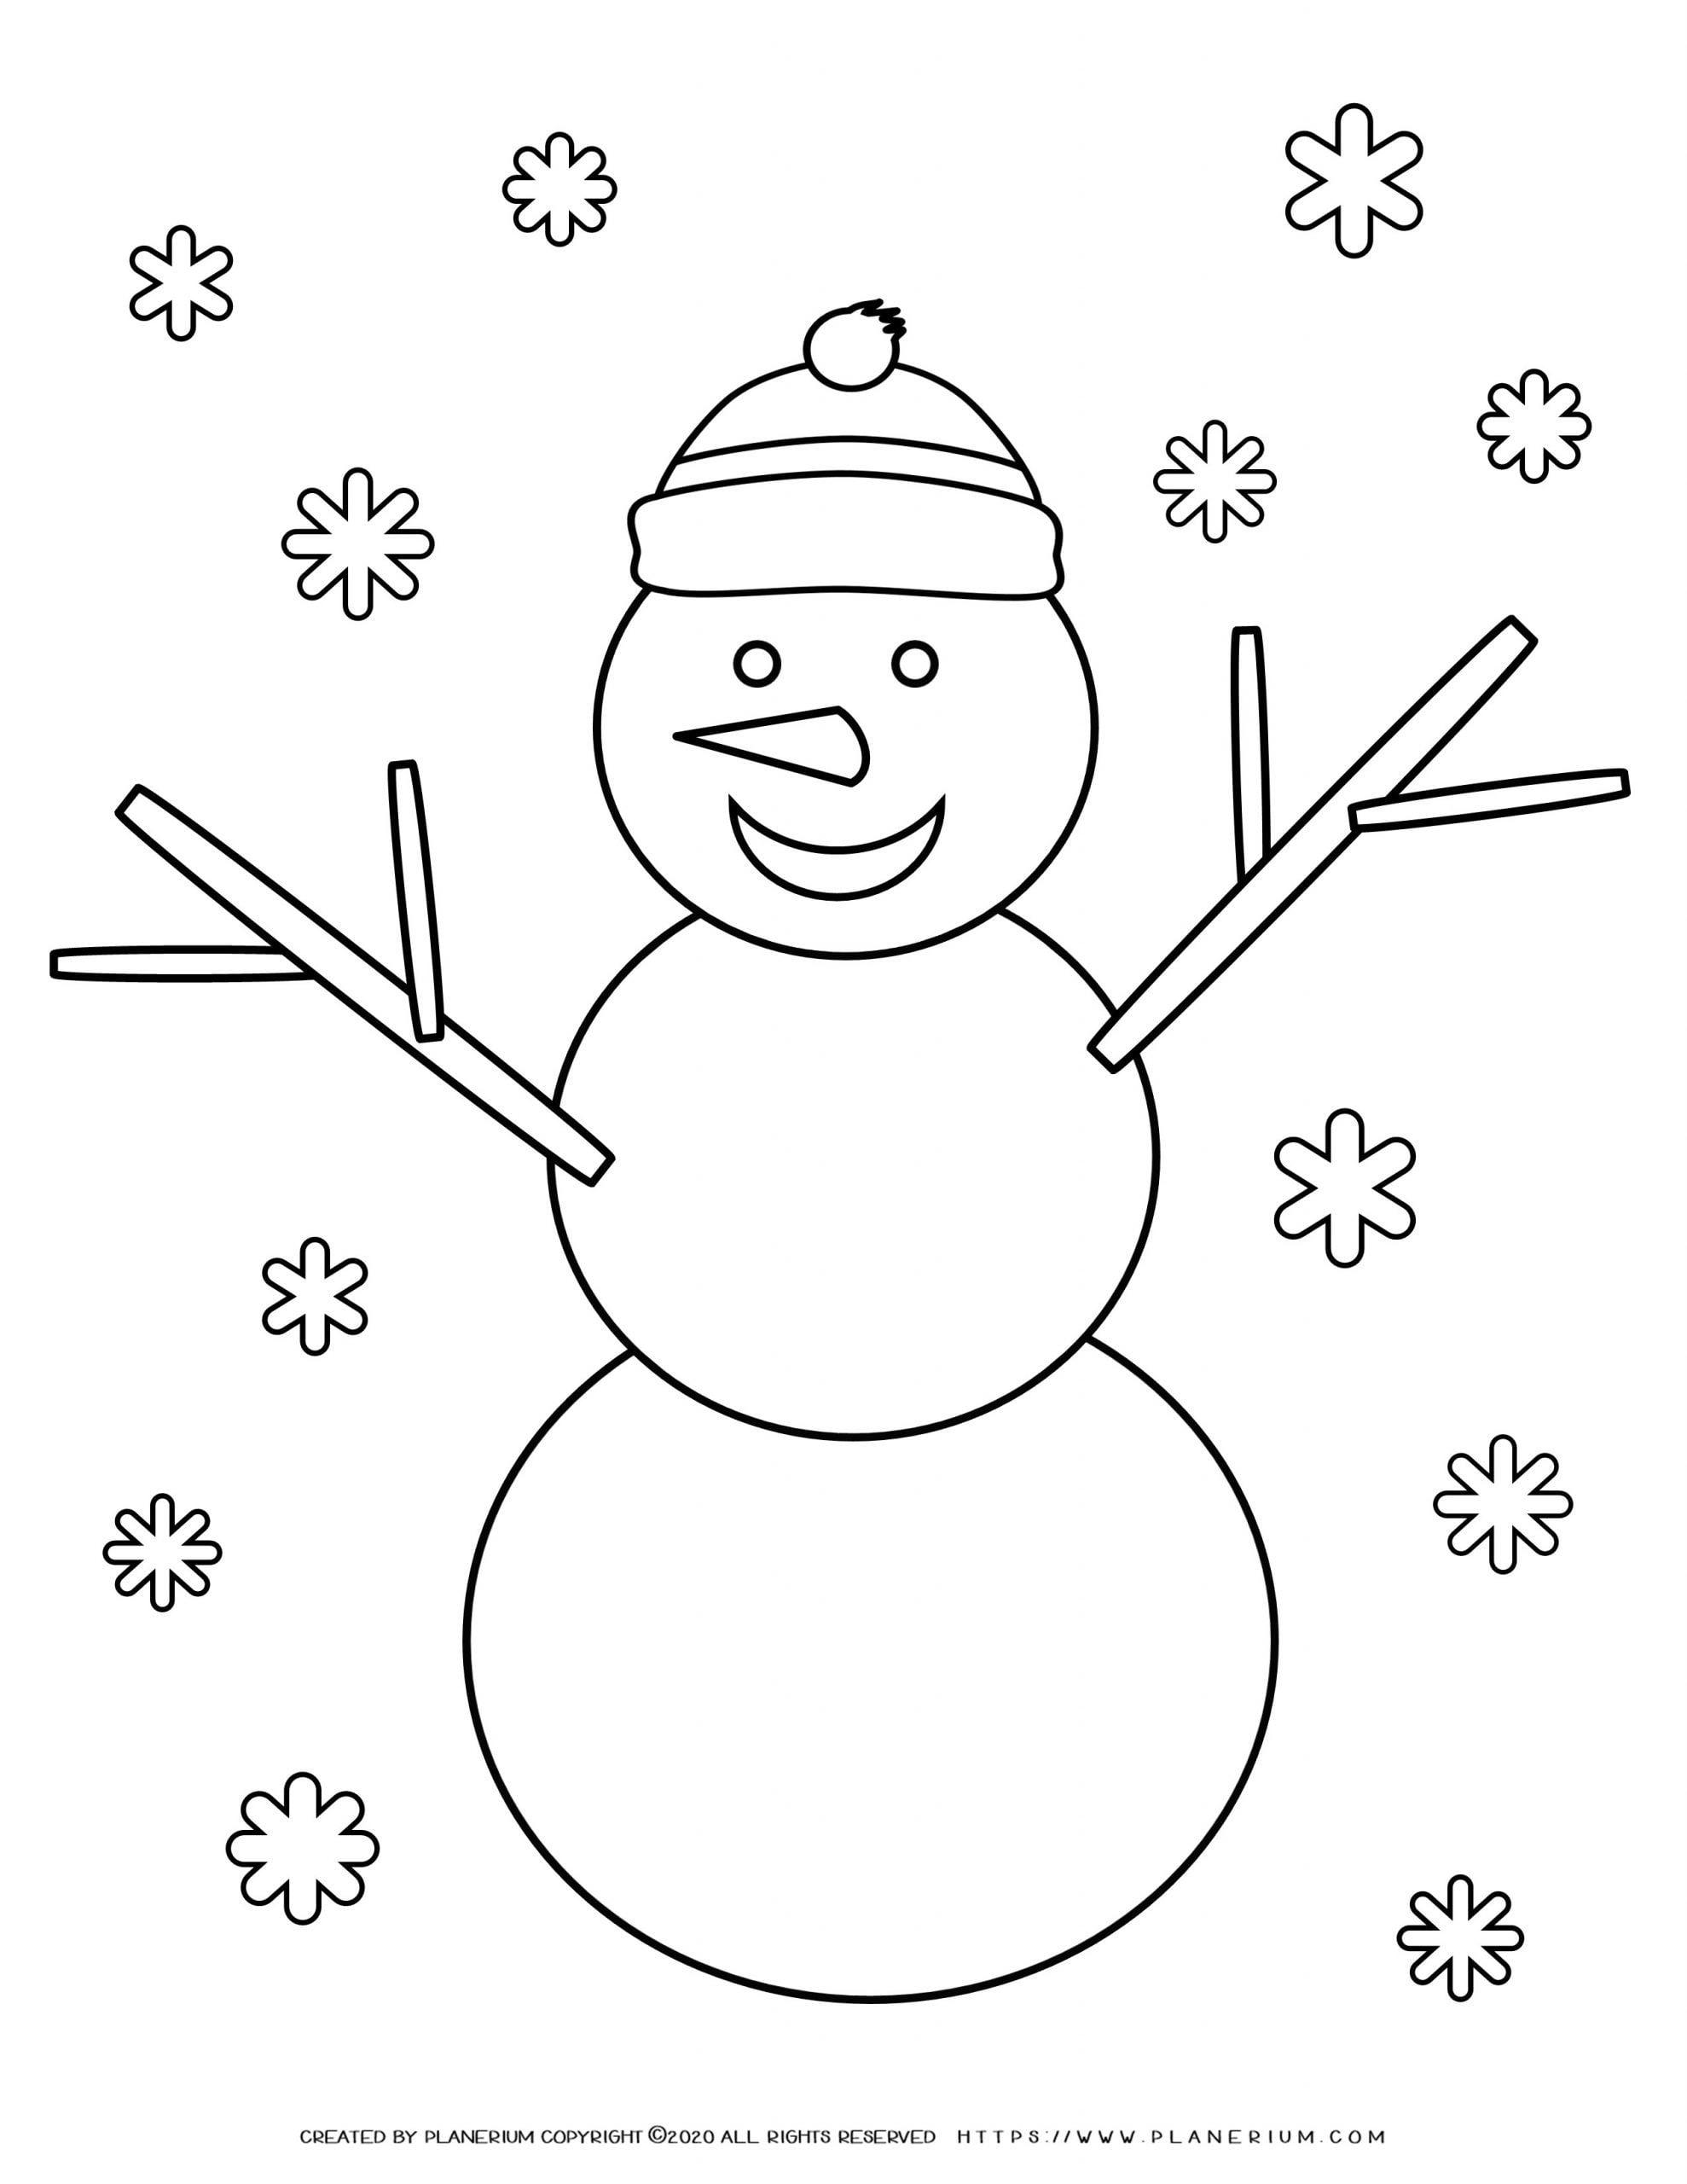 Winter Coloring Page - Snowman   Planerium